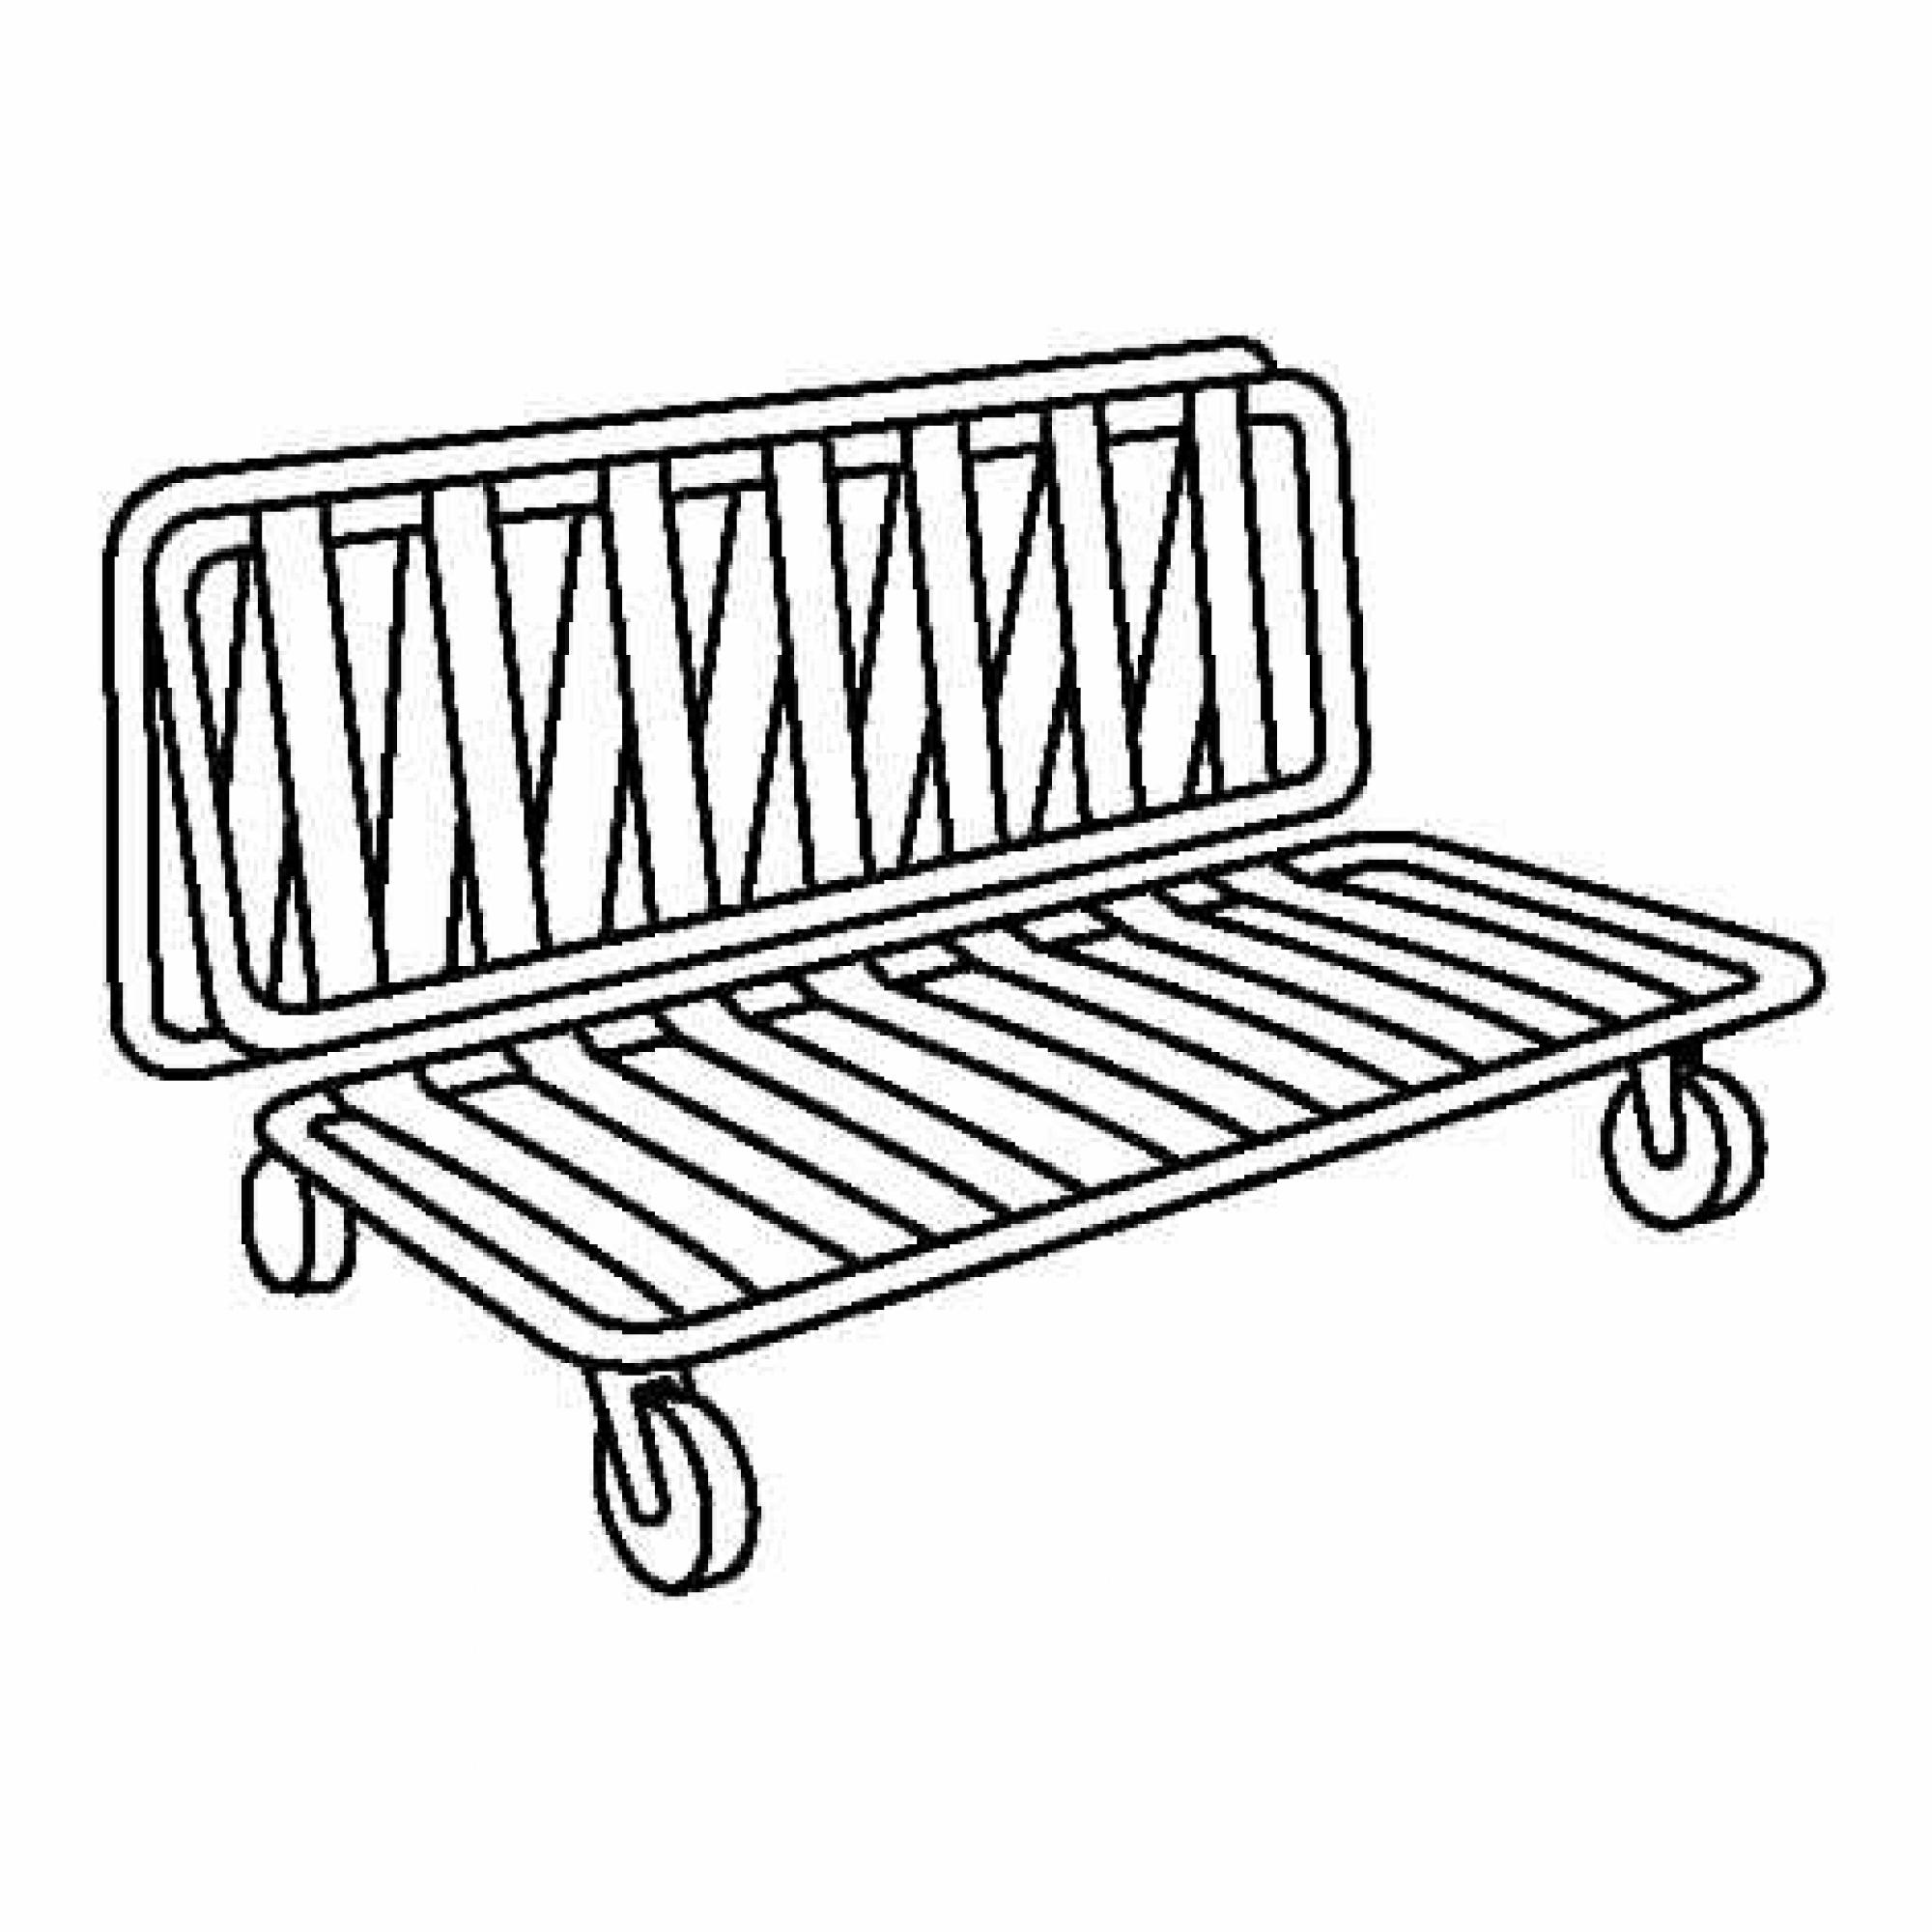 Ikea ps estructura sof cama 2 plazas - Sofa cama pequeno ikea ...